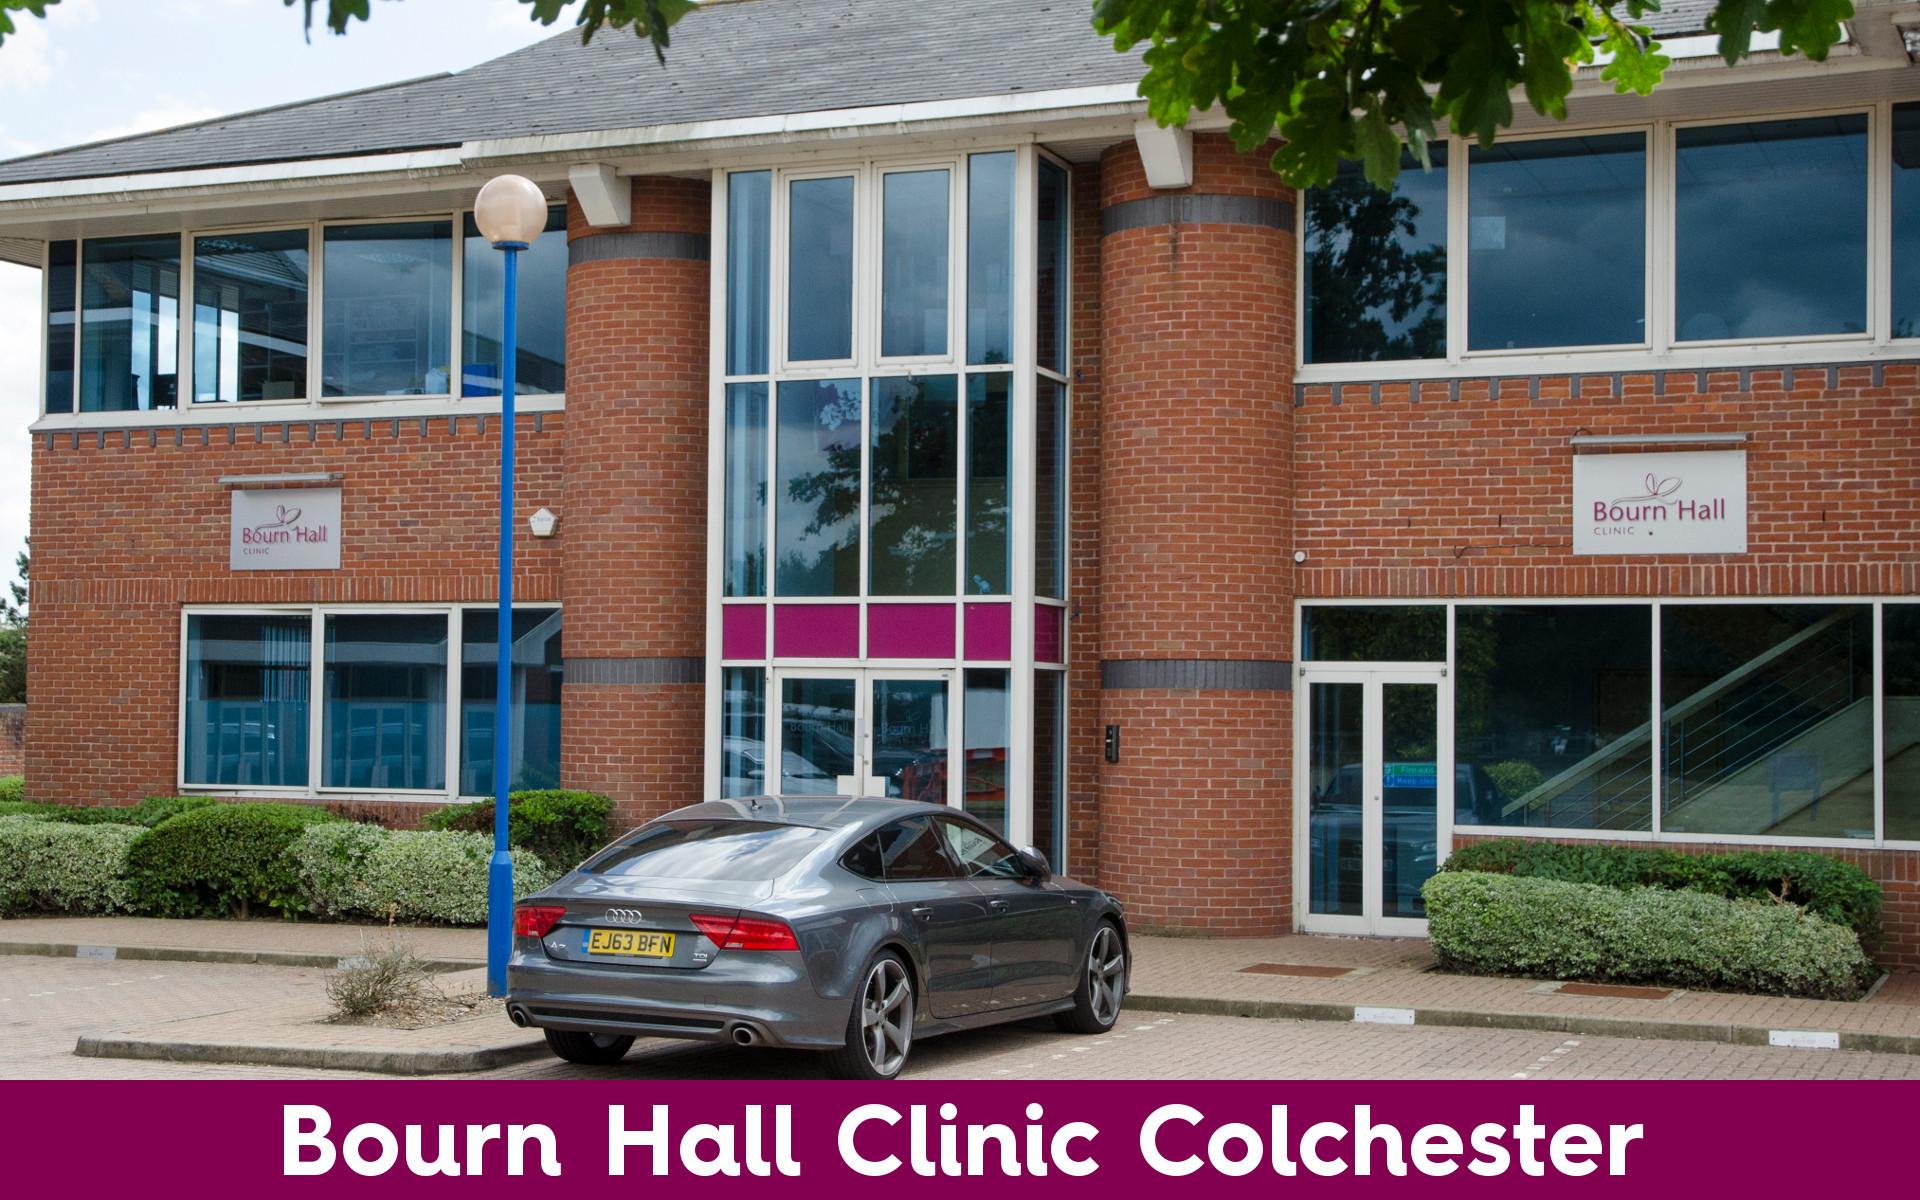 Bourn Hall Colchester